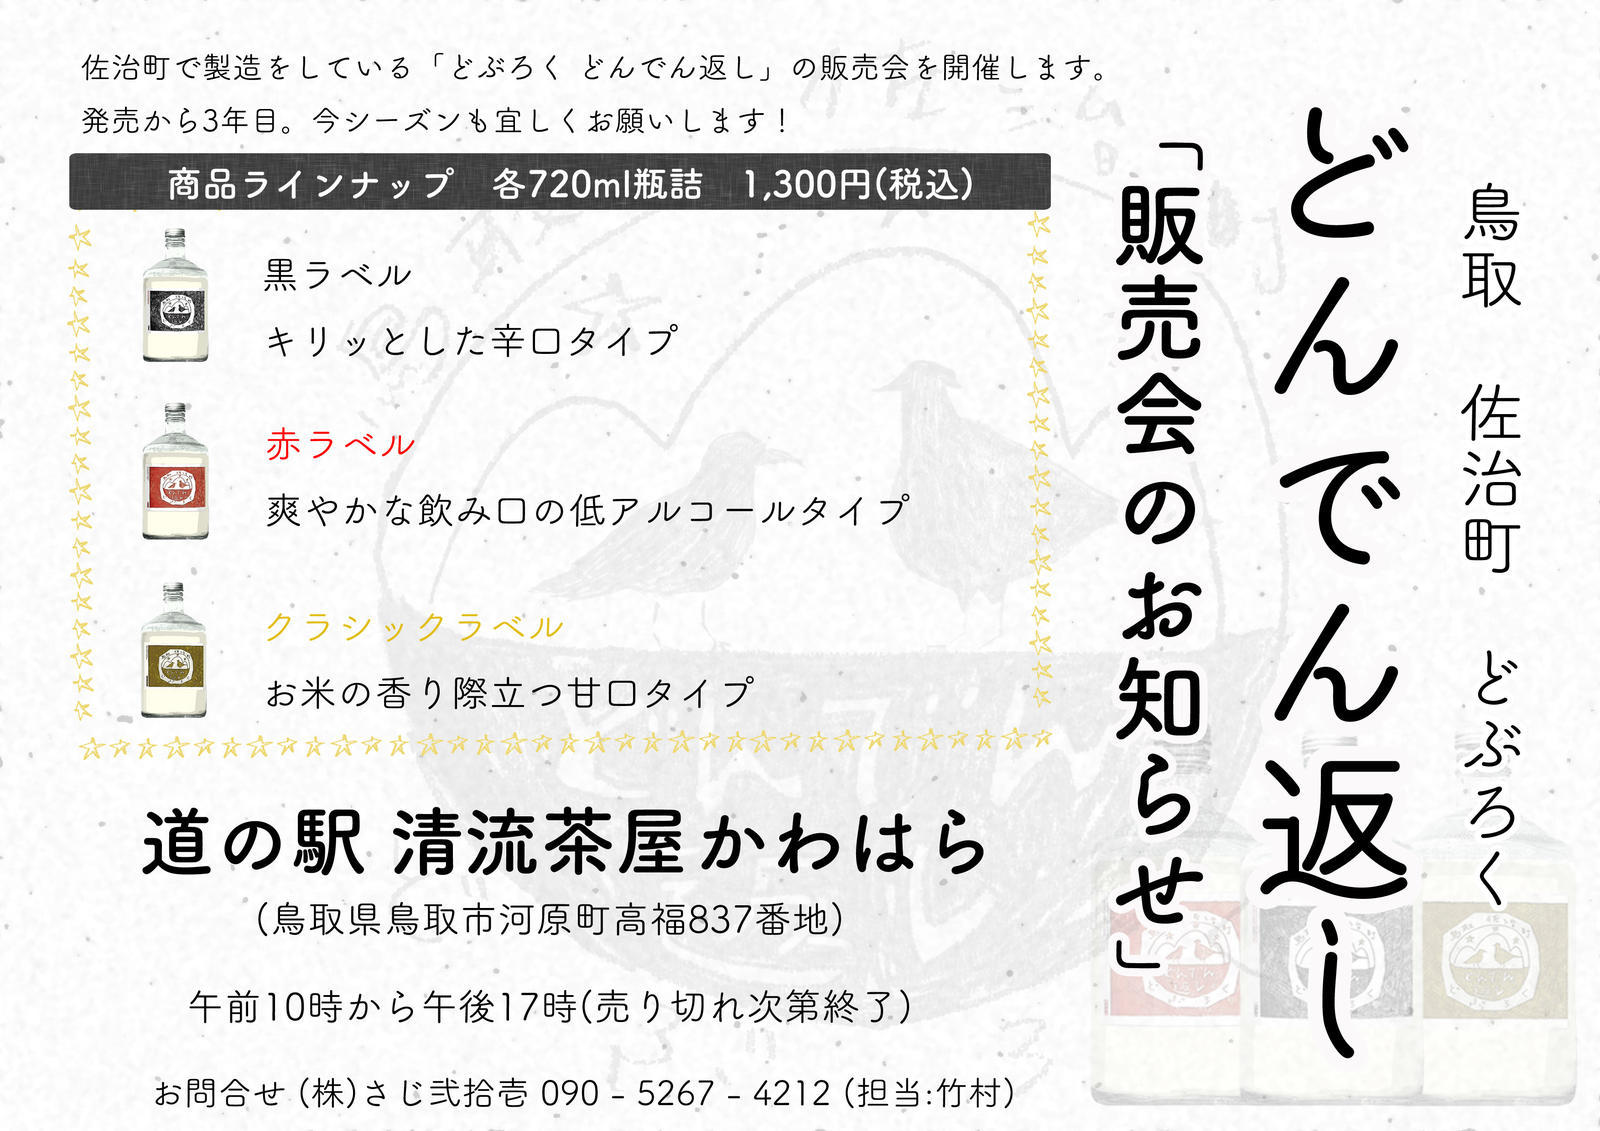 f:id:tottoridekurasu:20181030123441j:plain